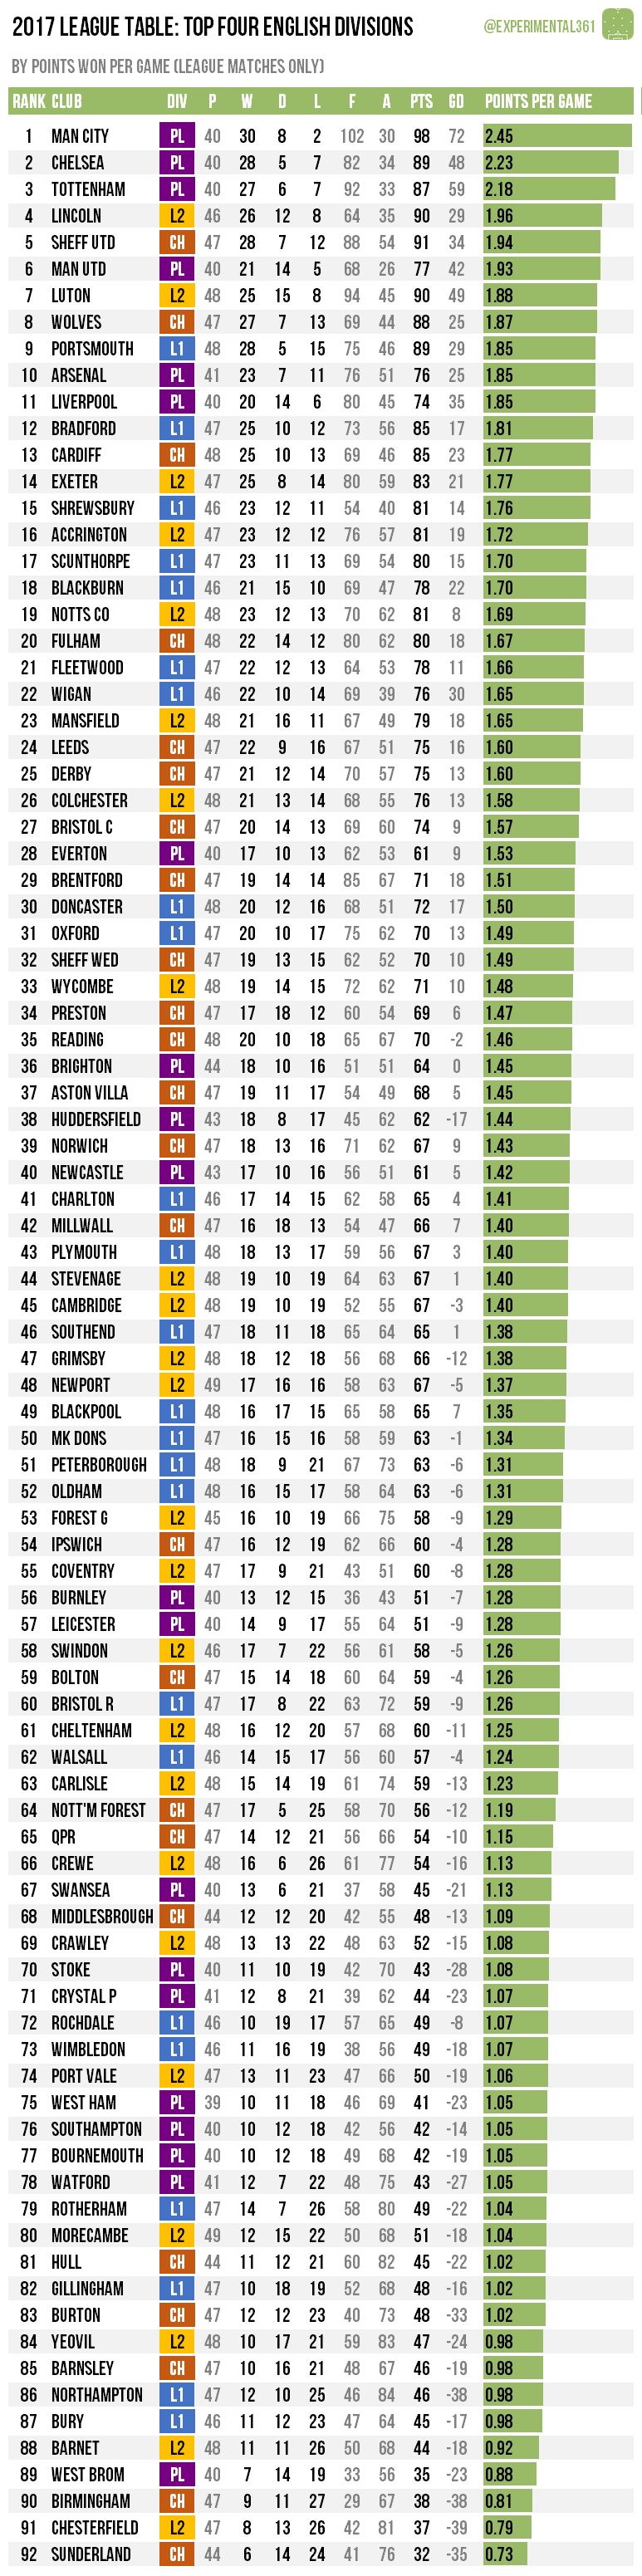 2017 League Table | Experimental 3-6-1